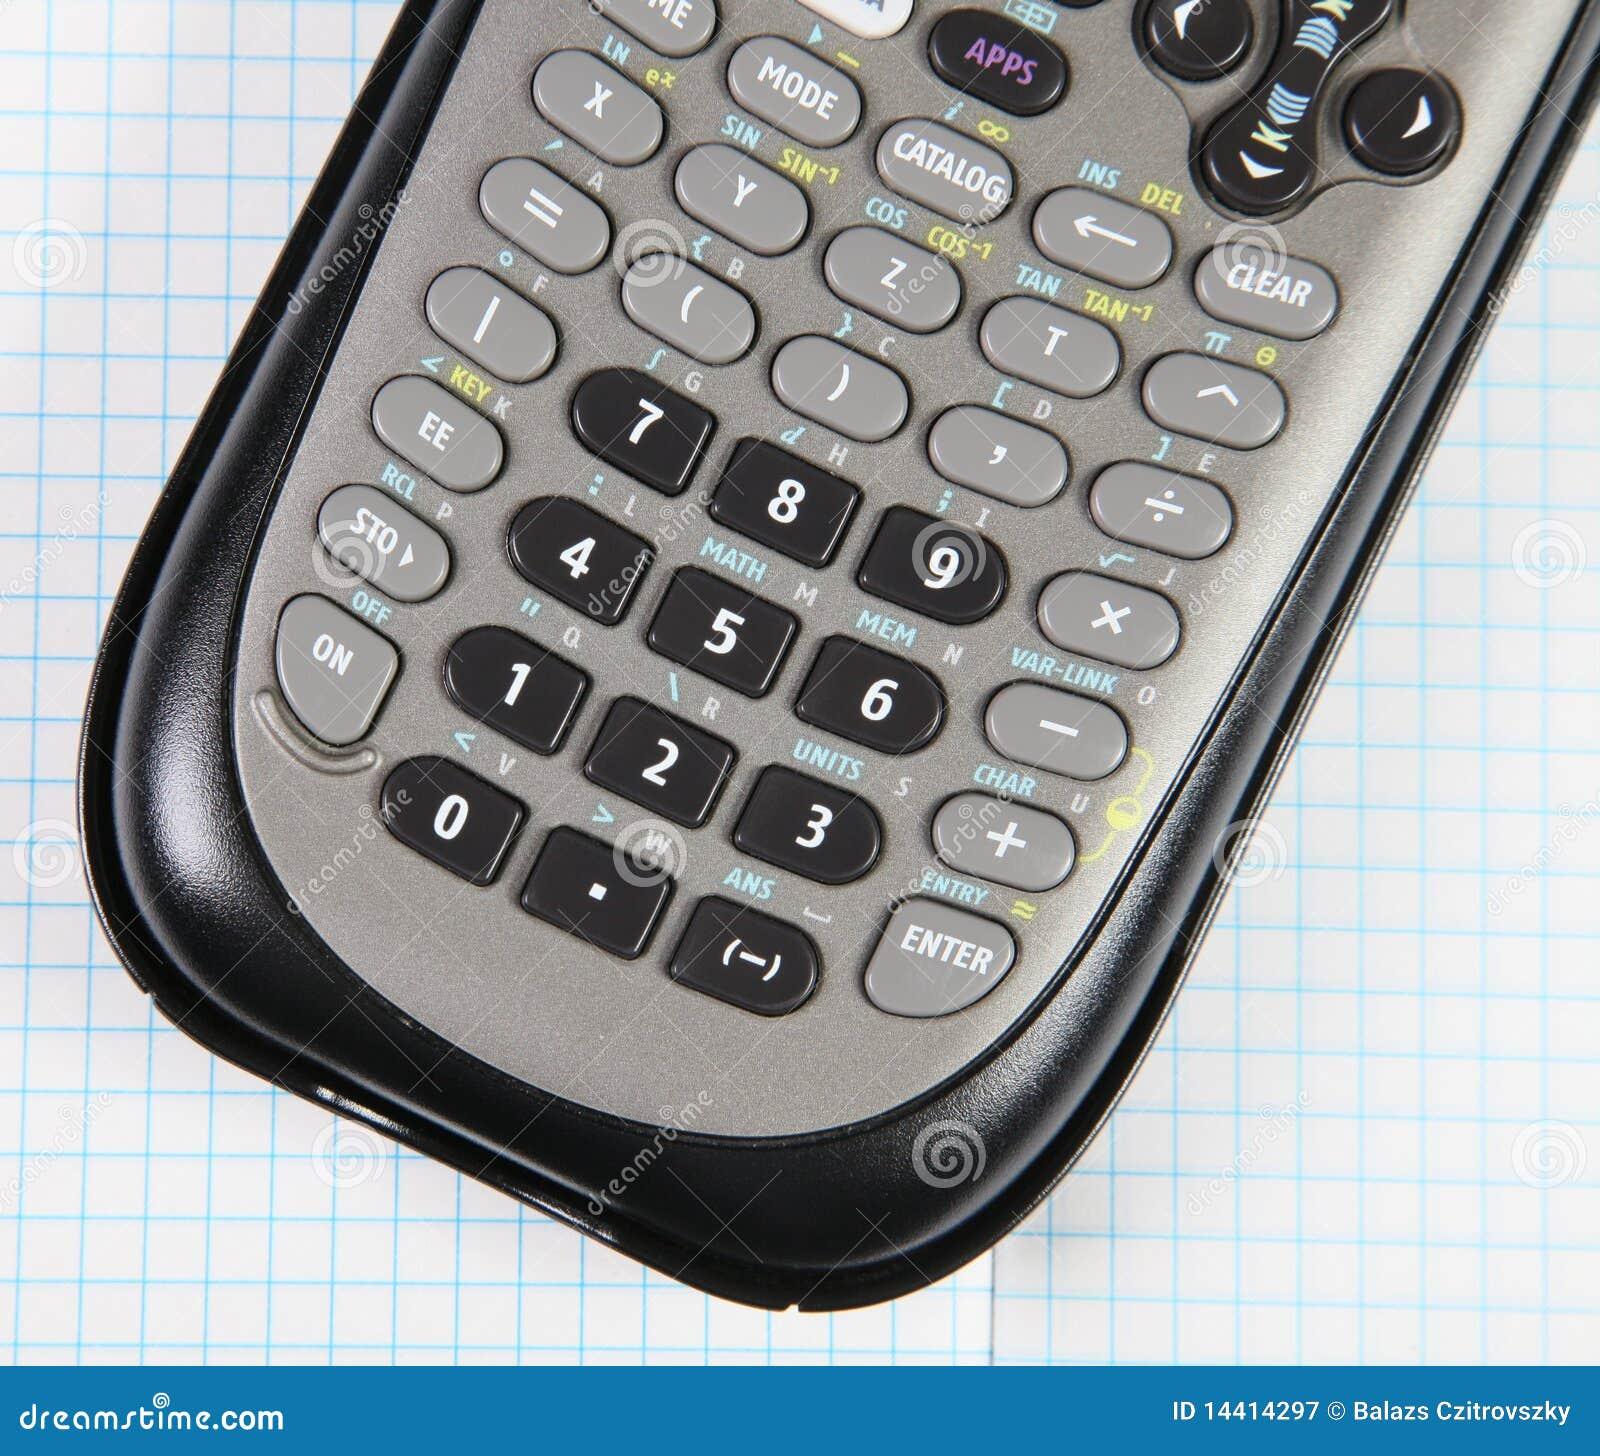 What Is Scientific Calculator?